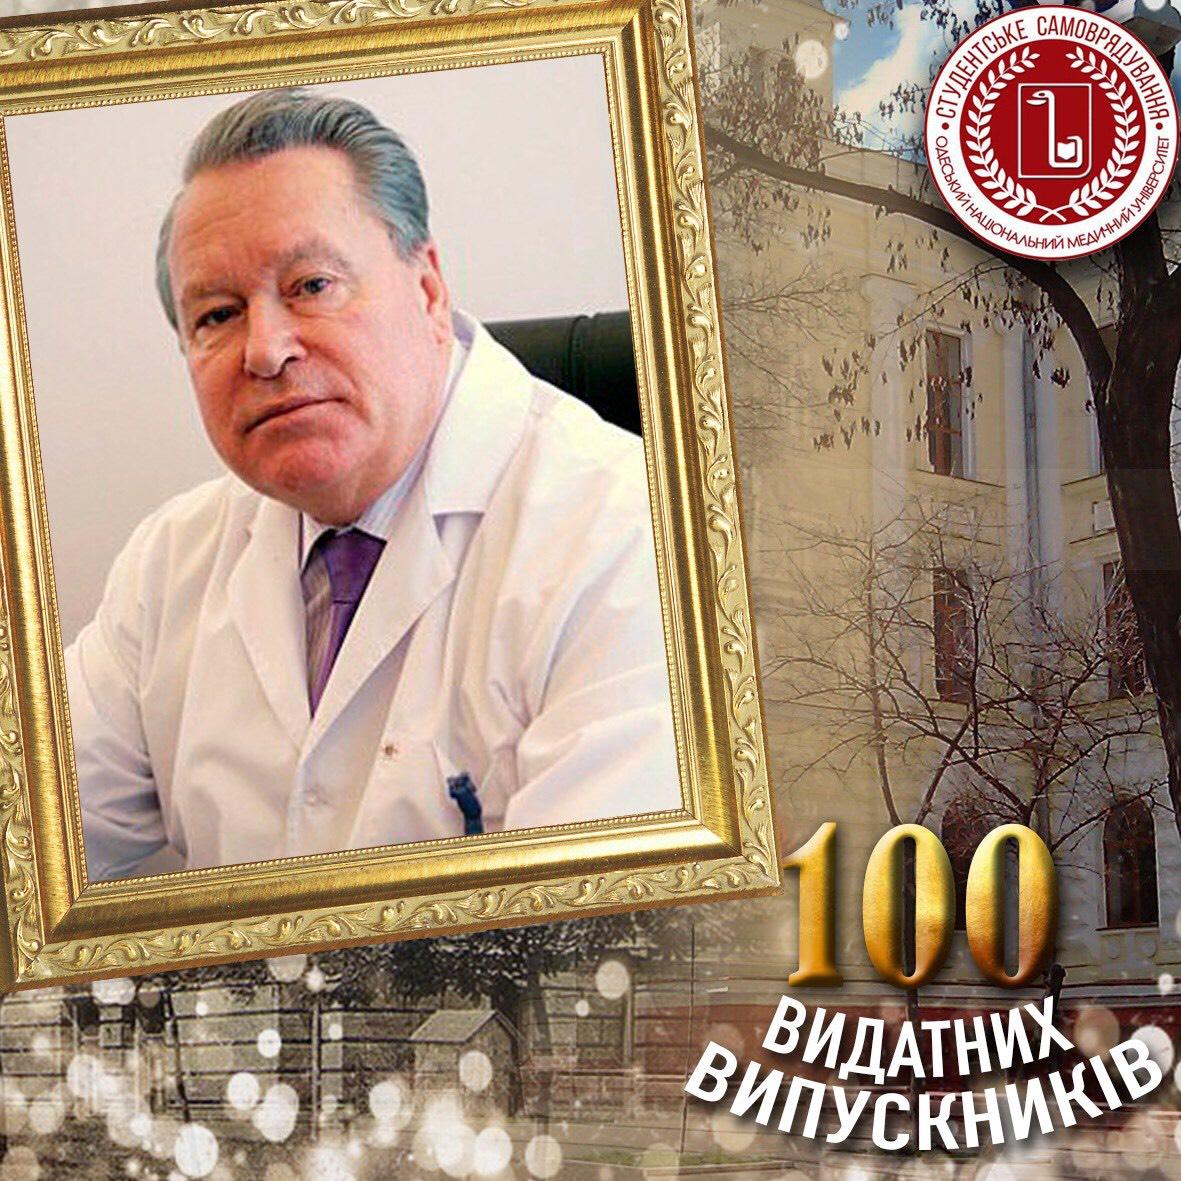 100 Outstanding Graduates (Zaporozhchenko Borys Serhiiovych)